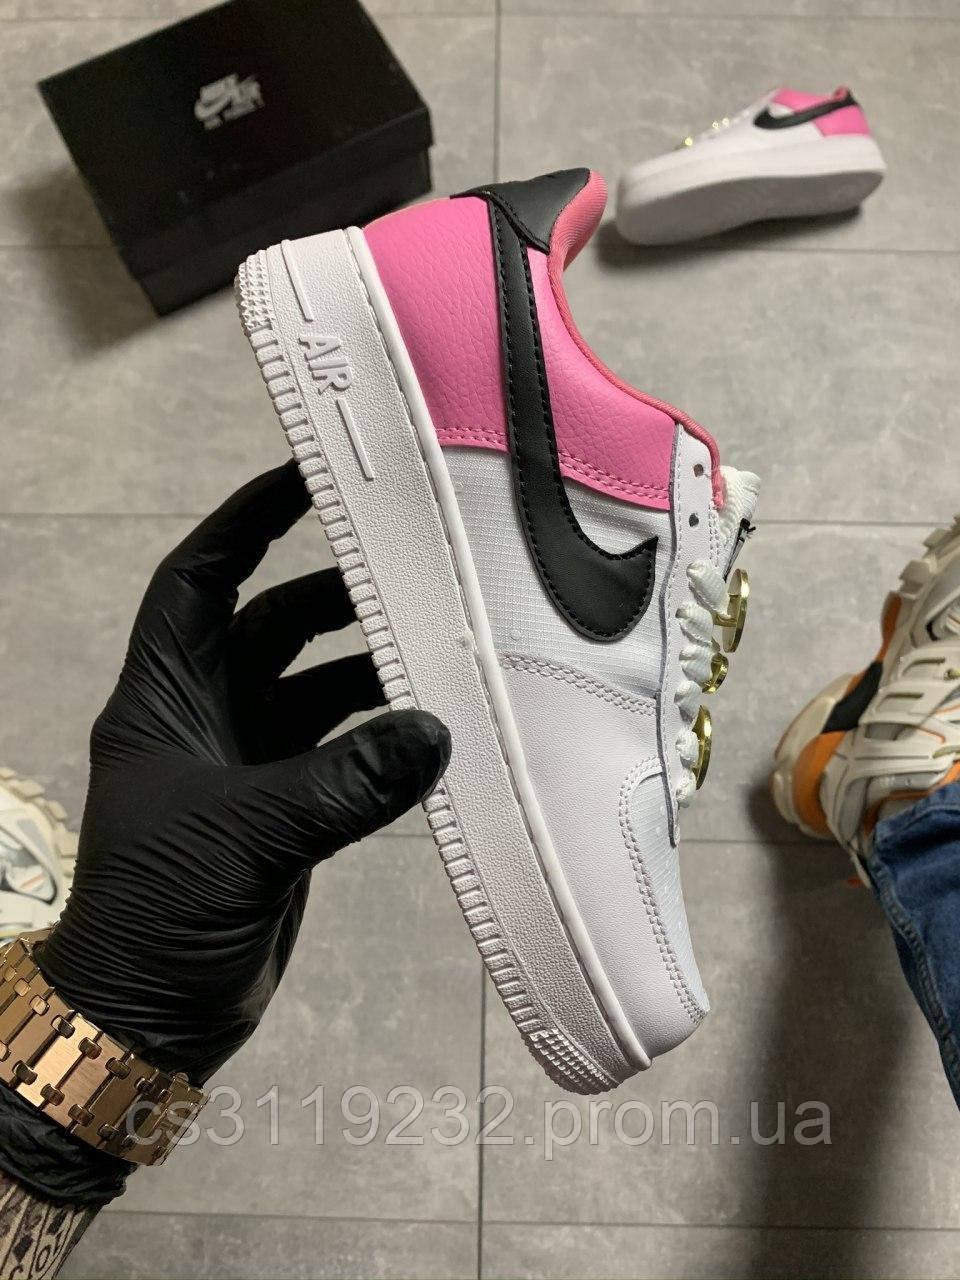 Женские кроссовки Nike Air Force Low Pink White (розово-белые)